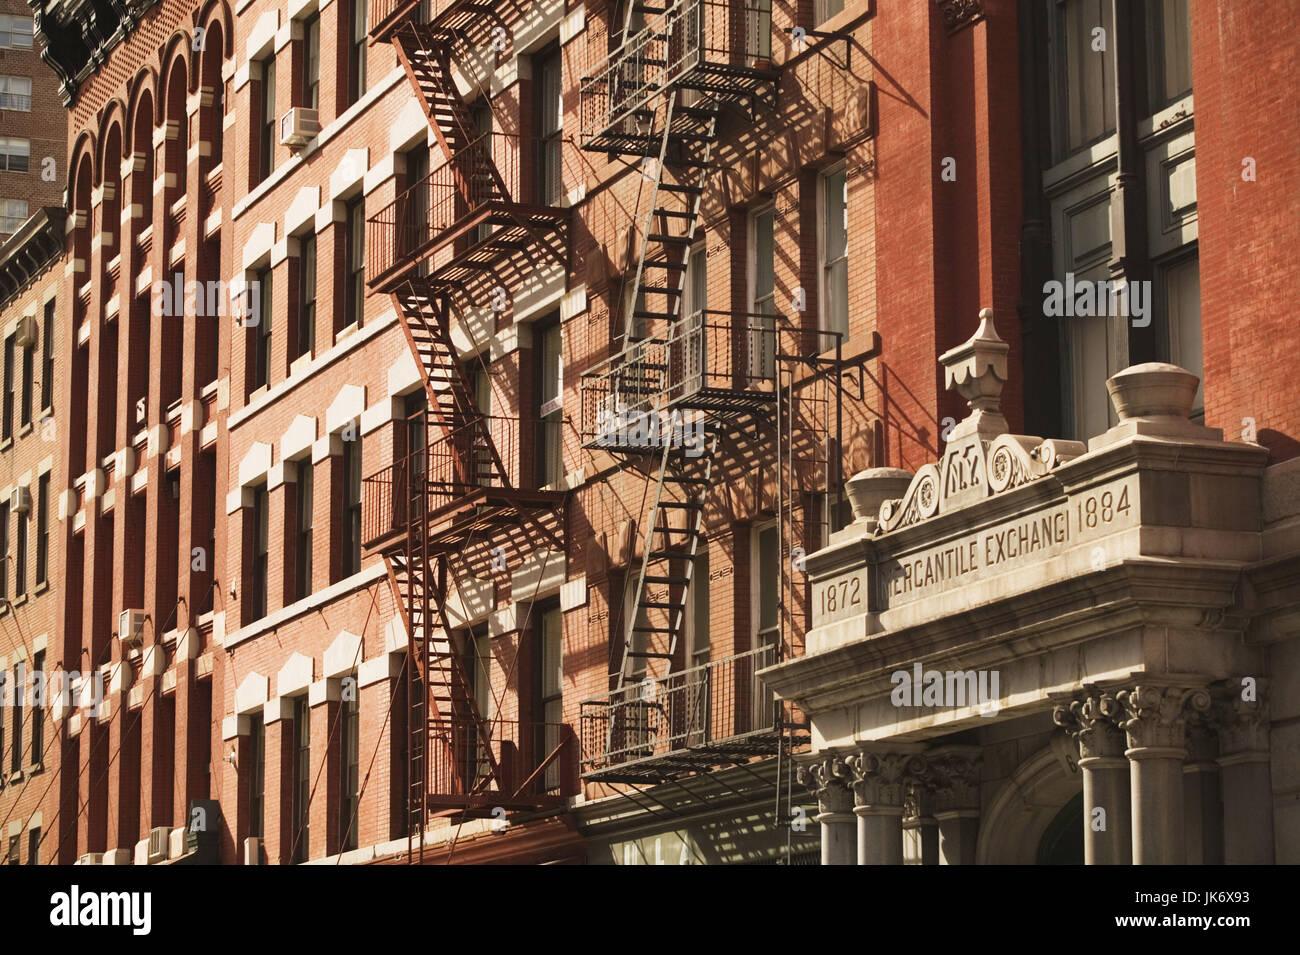 USA, New York City, Manhattan,  Harrison Street, Tribeca-Loft Buildings, New York Mercantile Exchange Building, - Stock Image